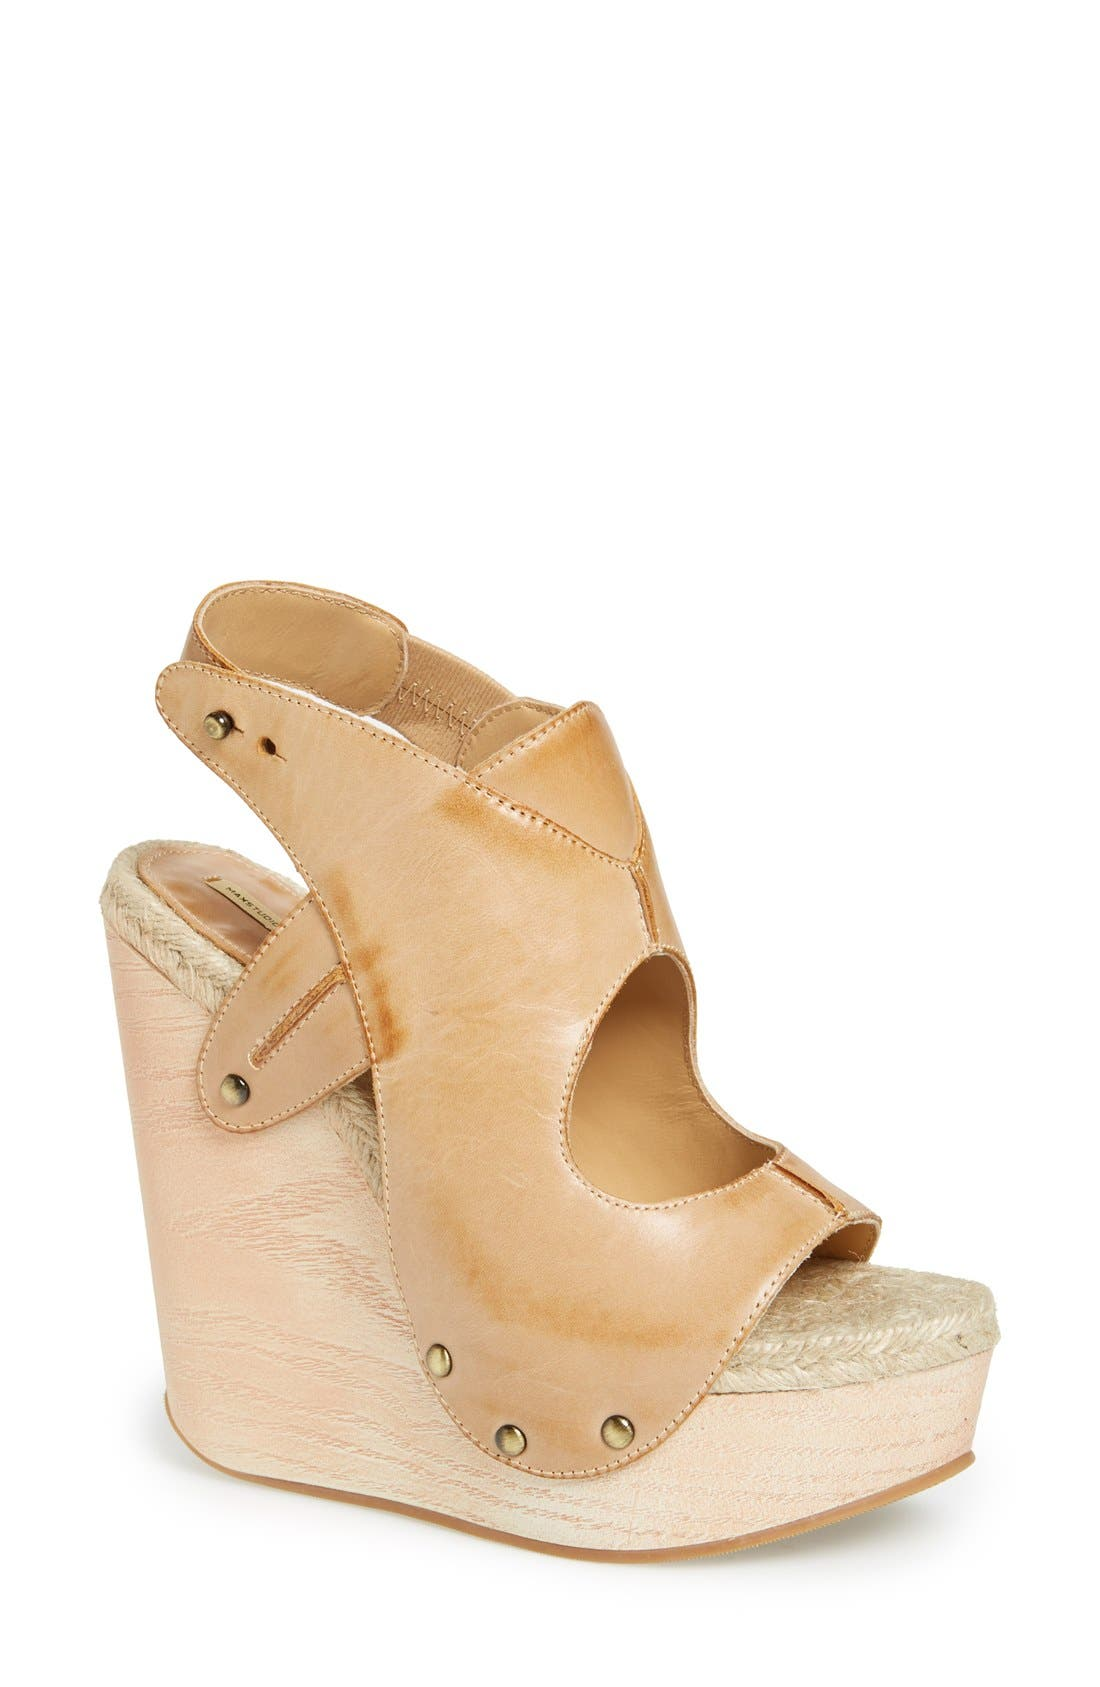 Main Image - MAXSTUDIO 'Fiore' Platform Wedge Sandal (Women)